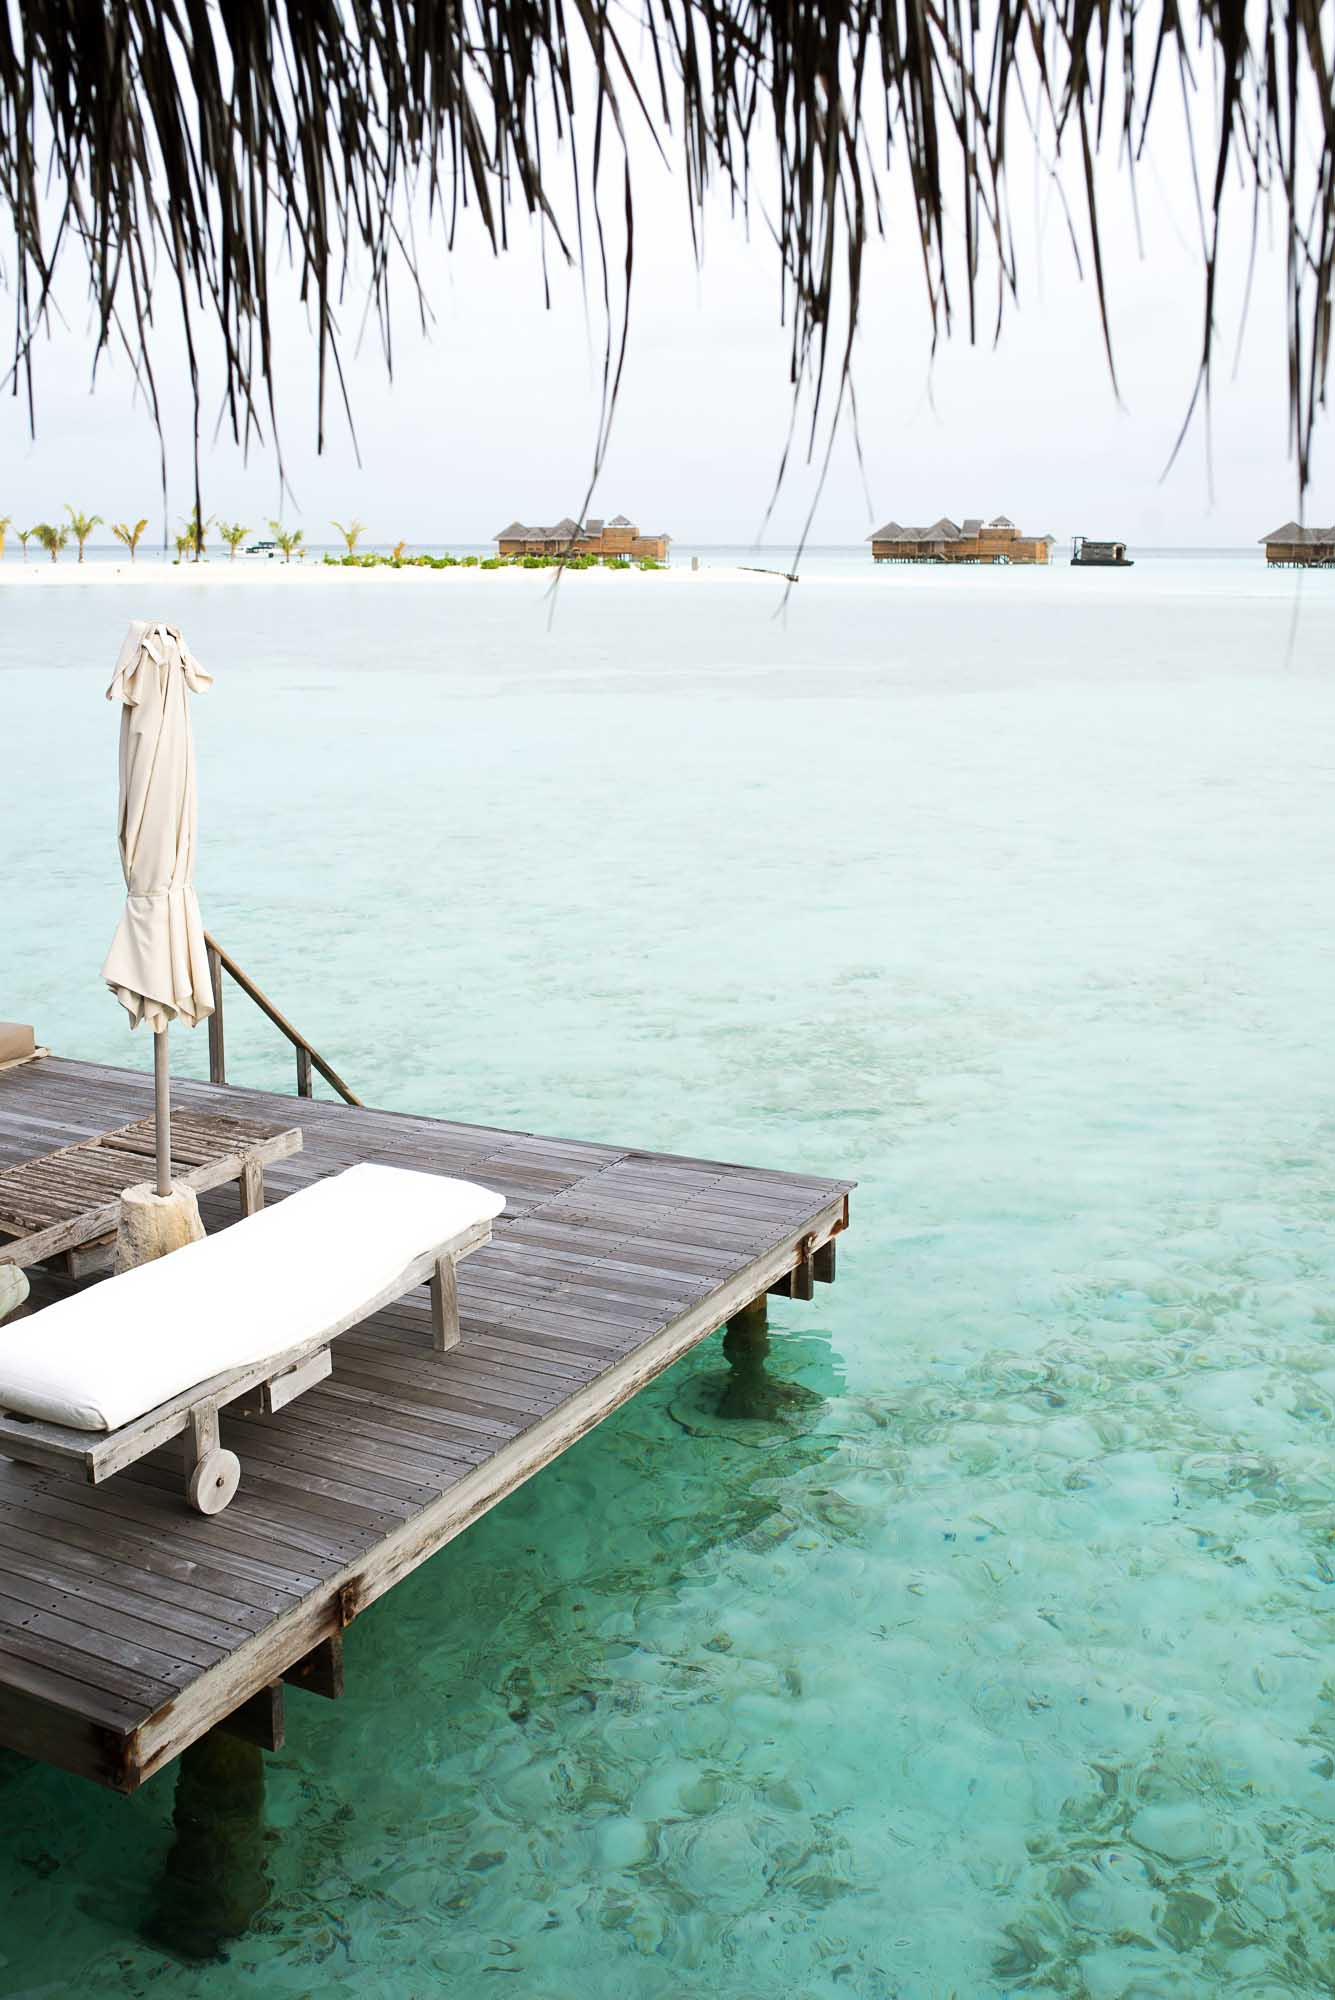 Gili Lankanfushi eco luxury resort in the Maldives